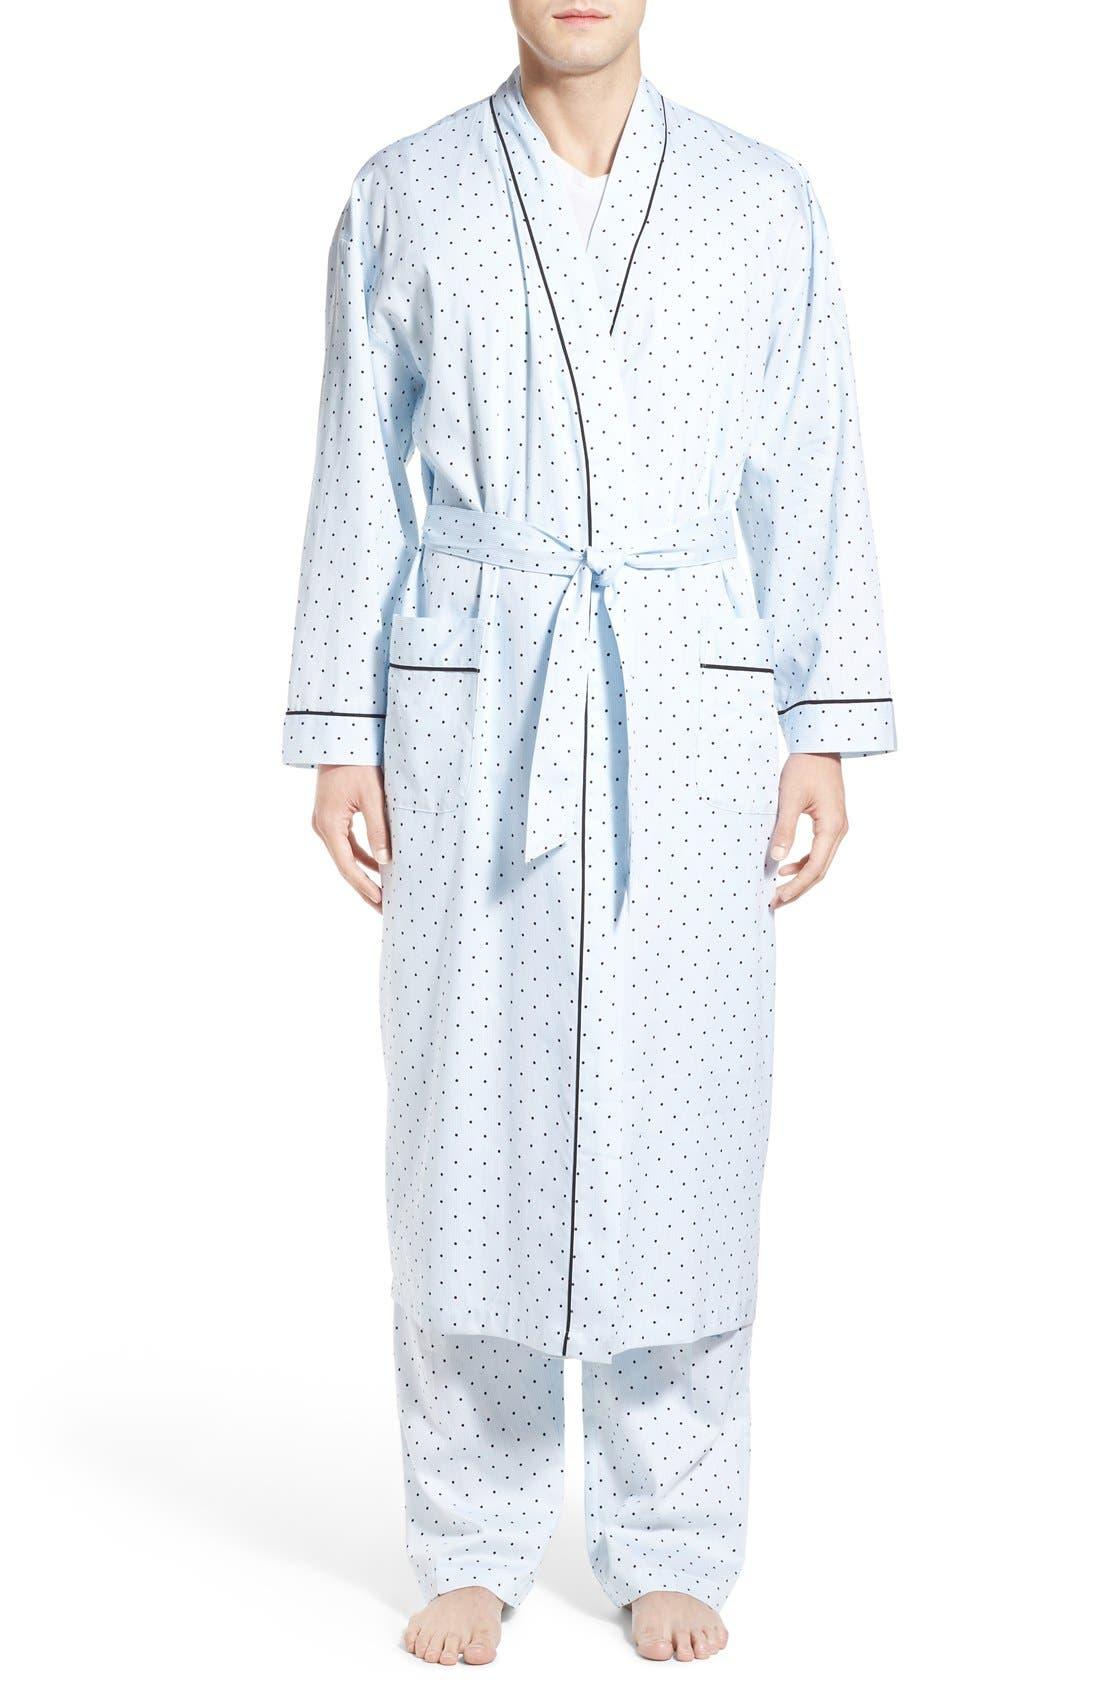 Main Image - Majestic International 'Twilight Blue' Cotton Robe